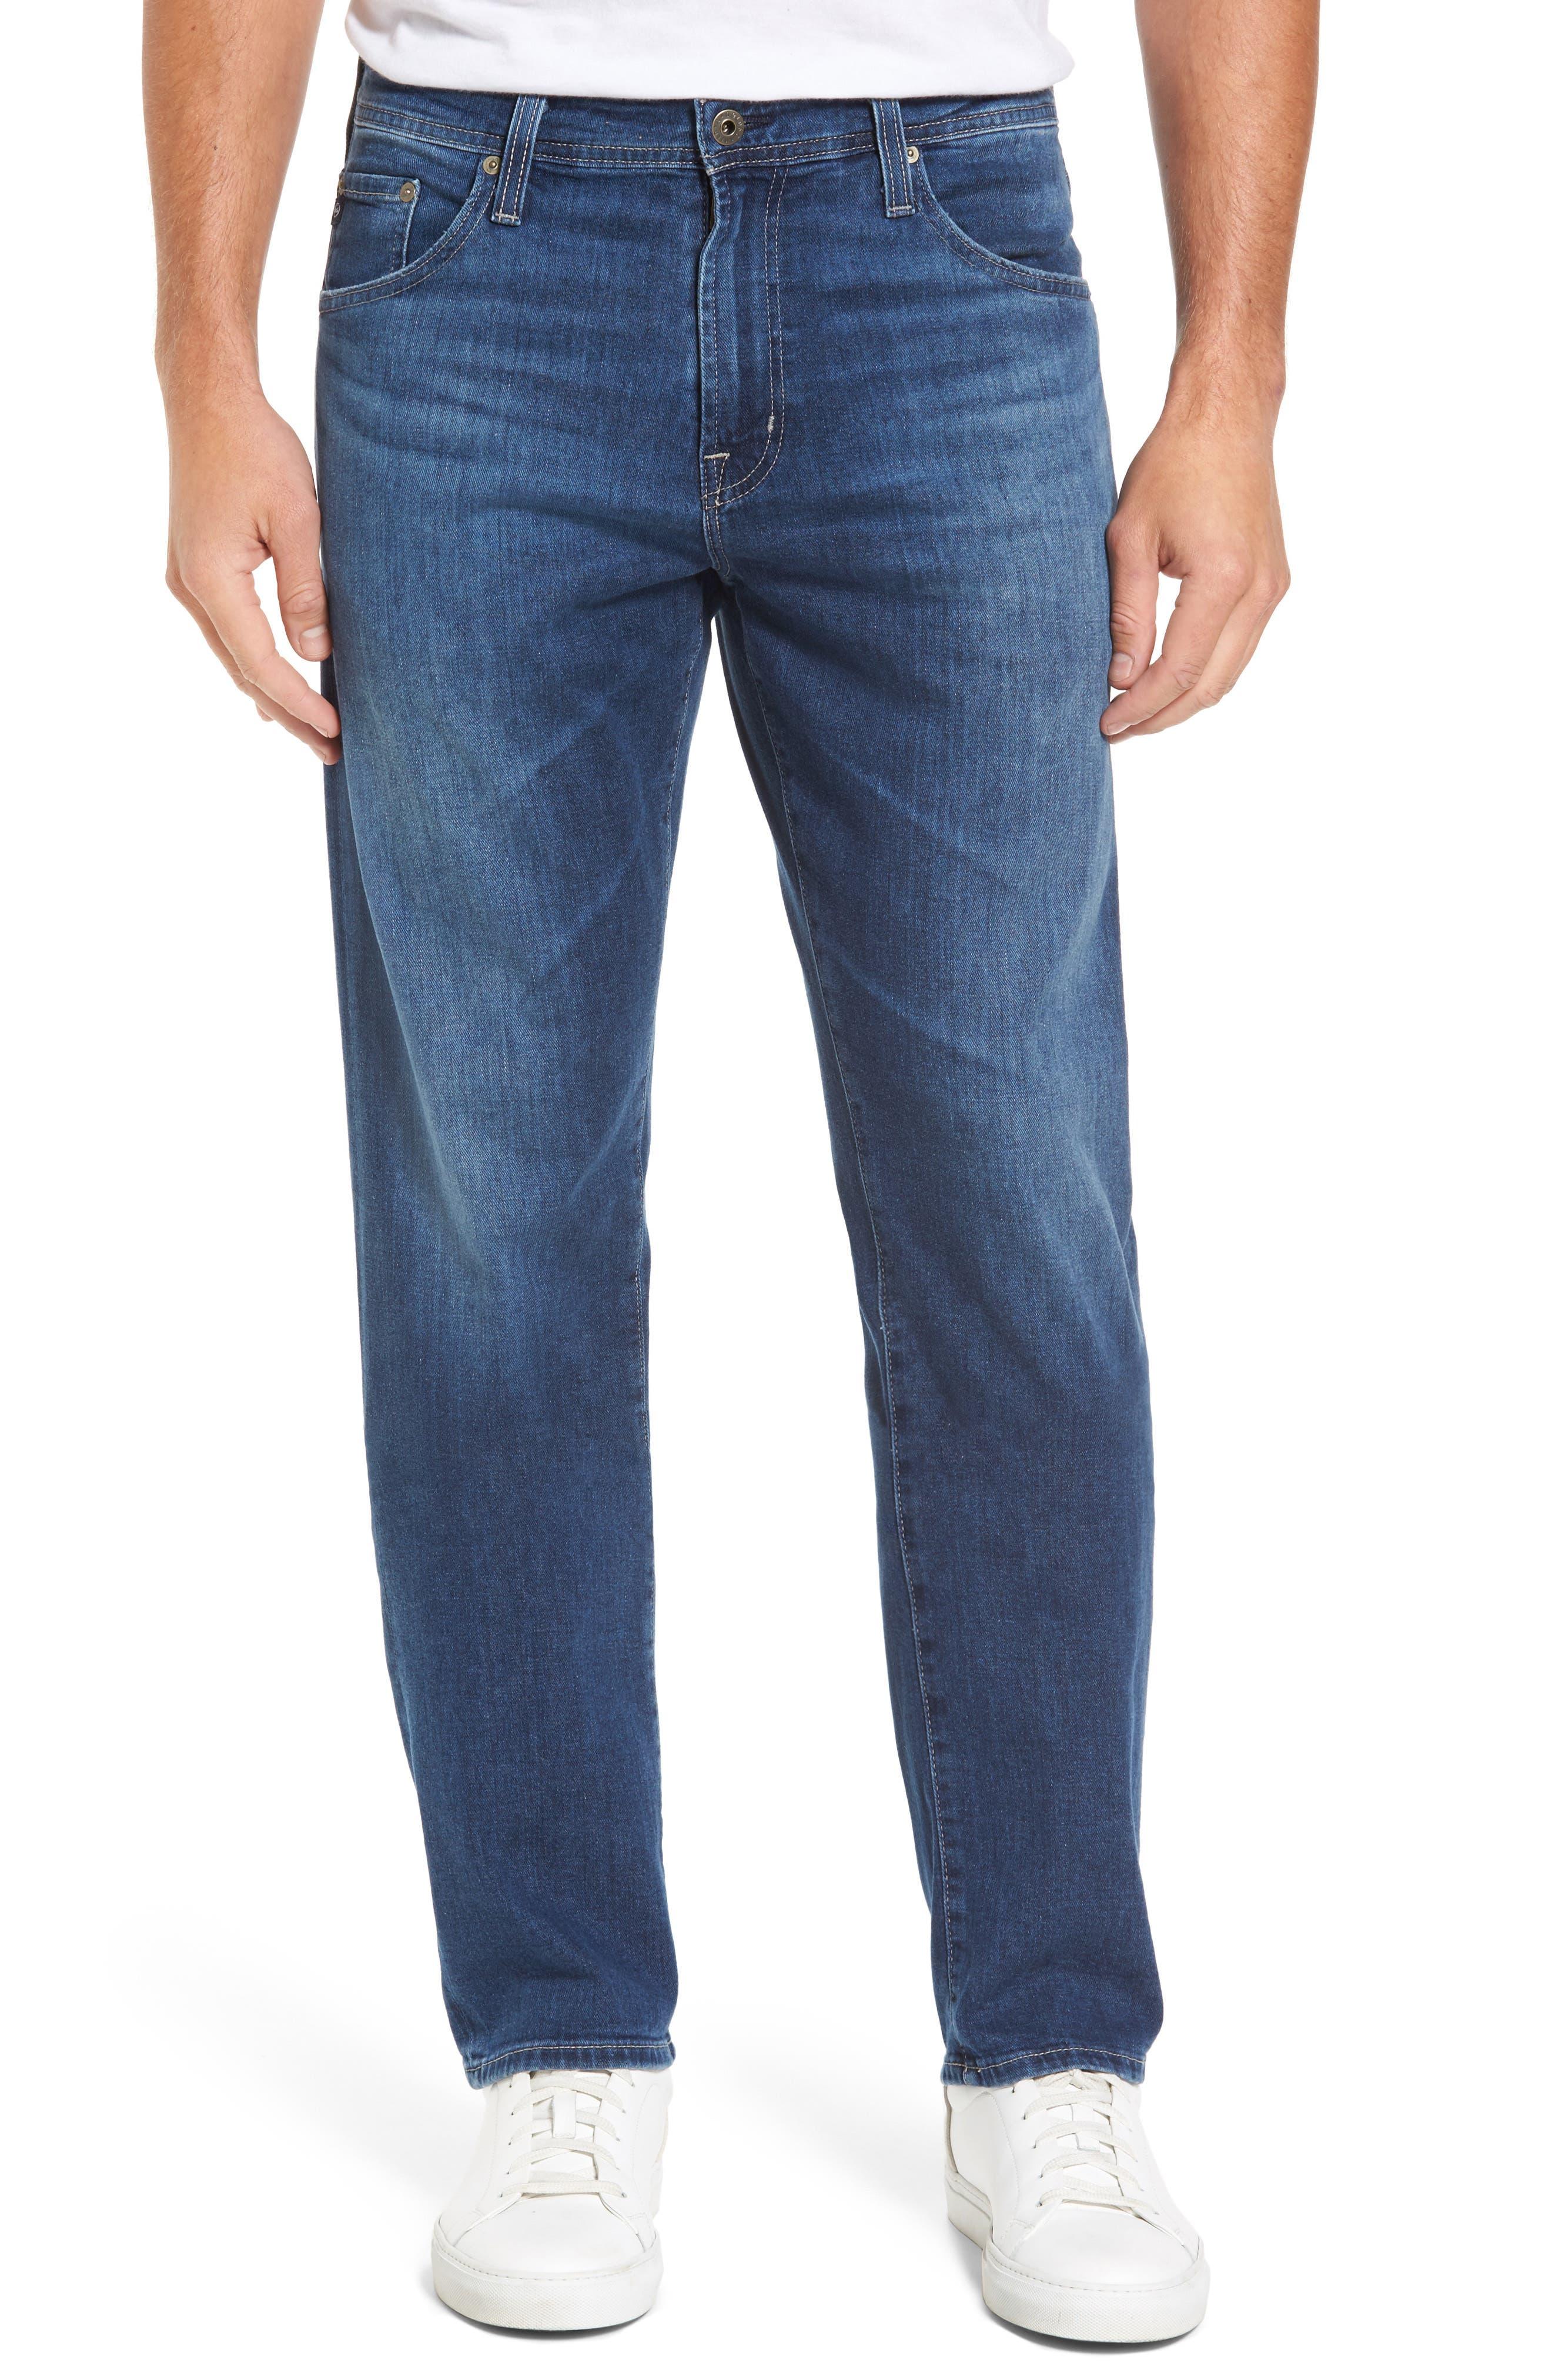 Ives Straight Leg Jeans,                             Main thumbnail 1, color,                             486